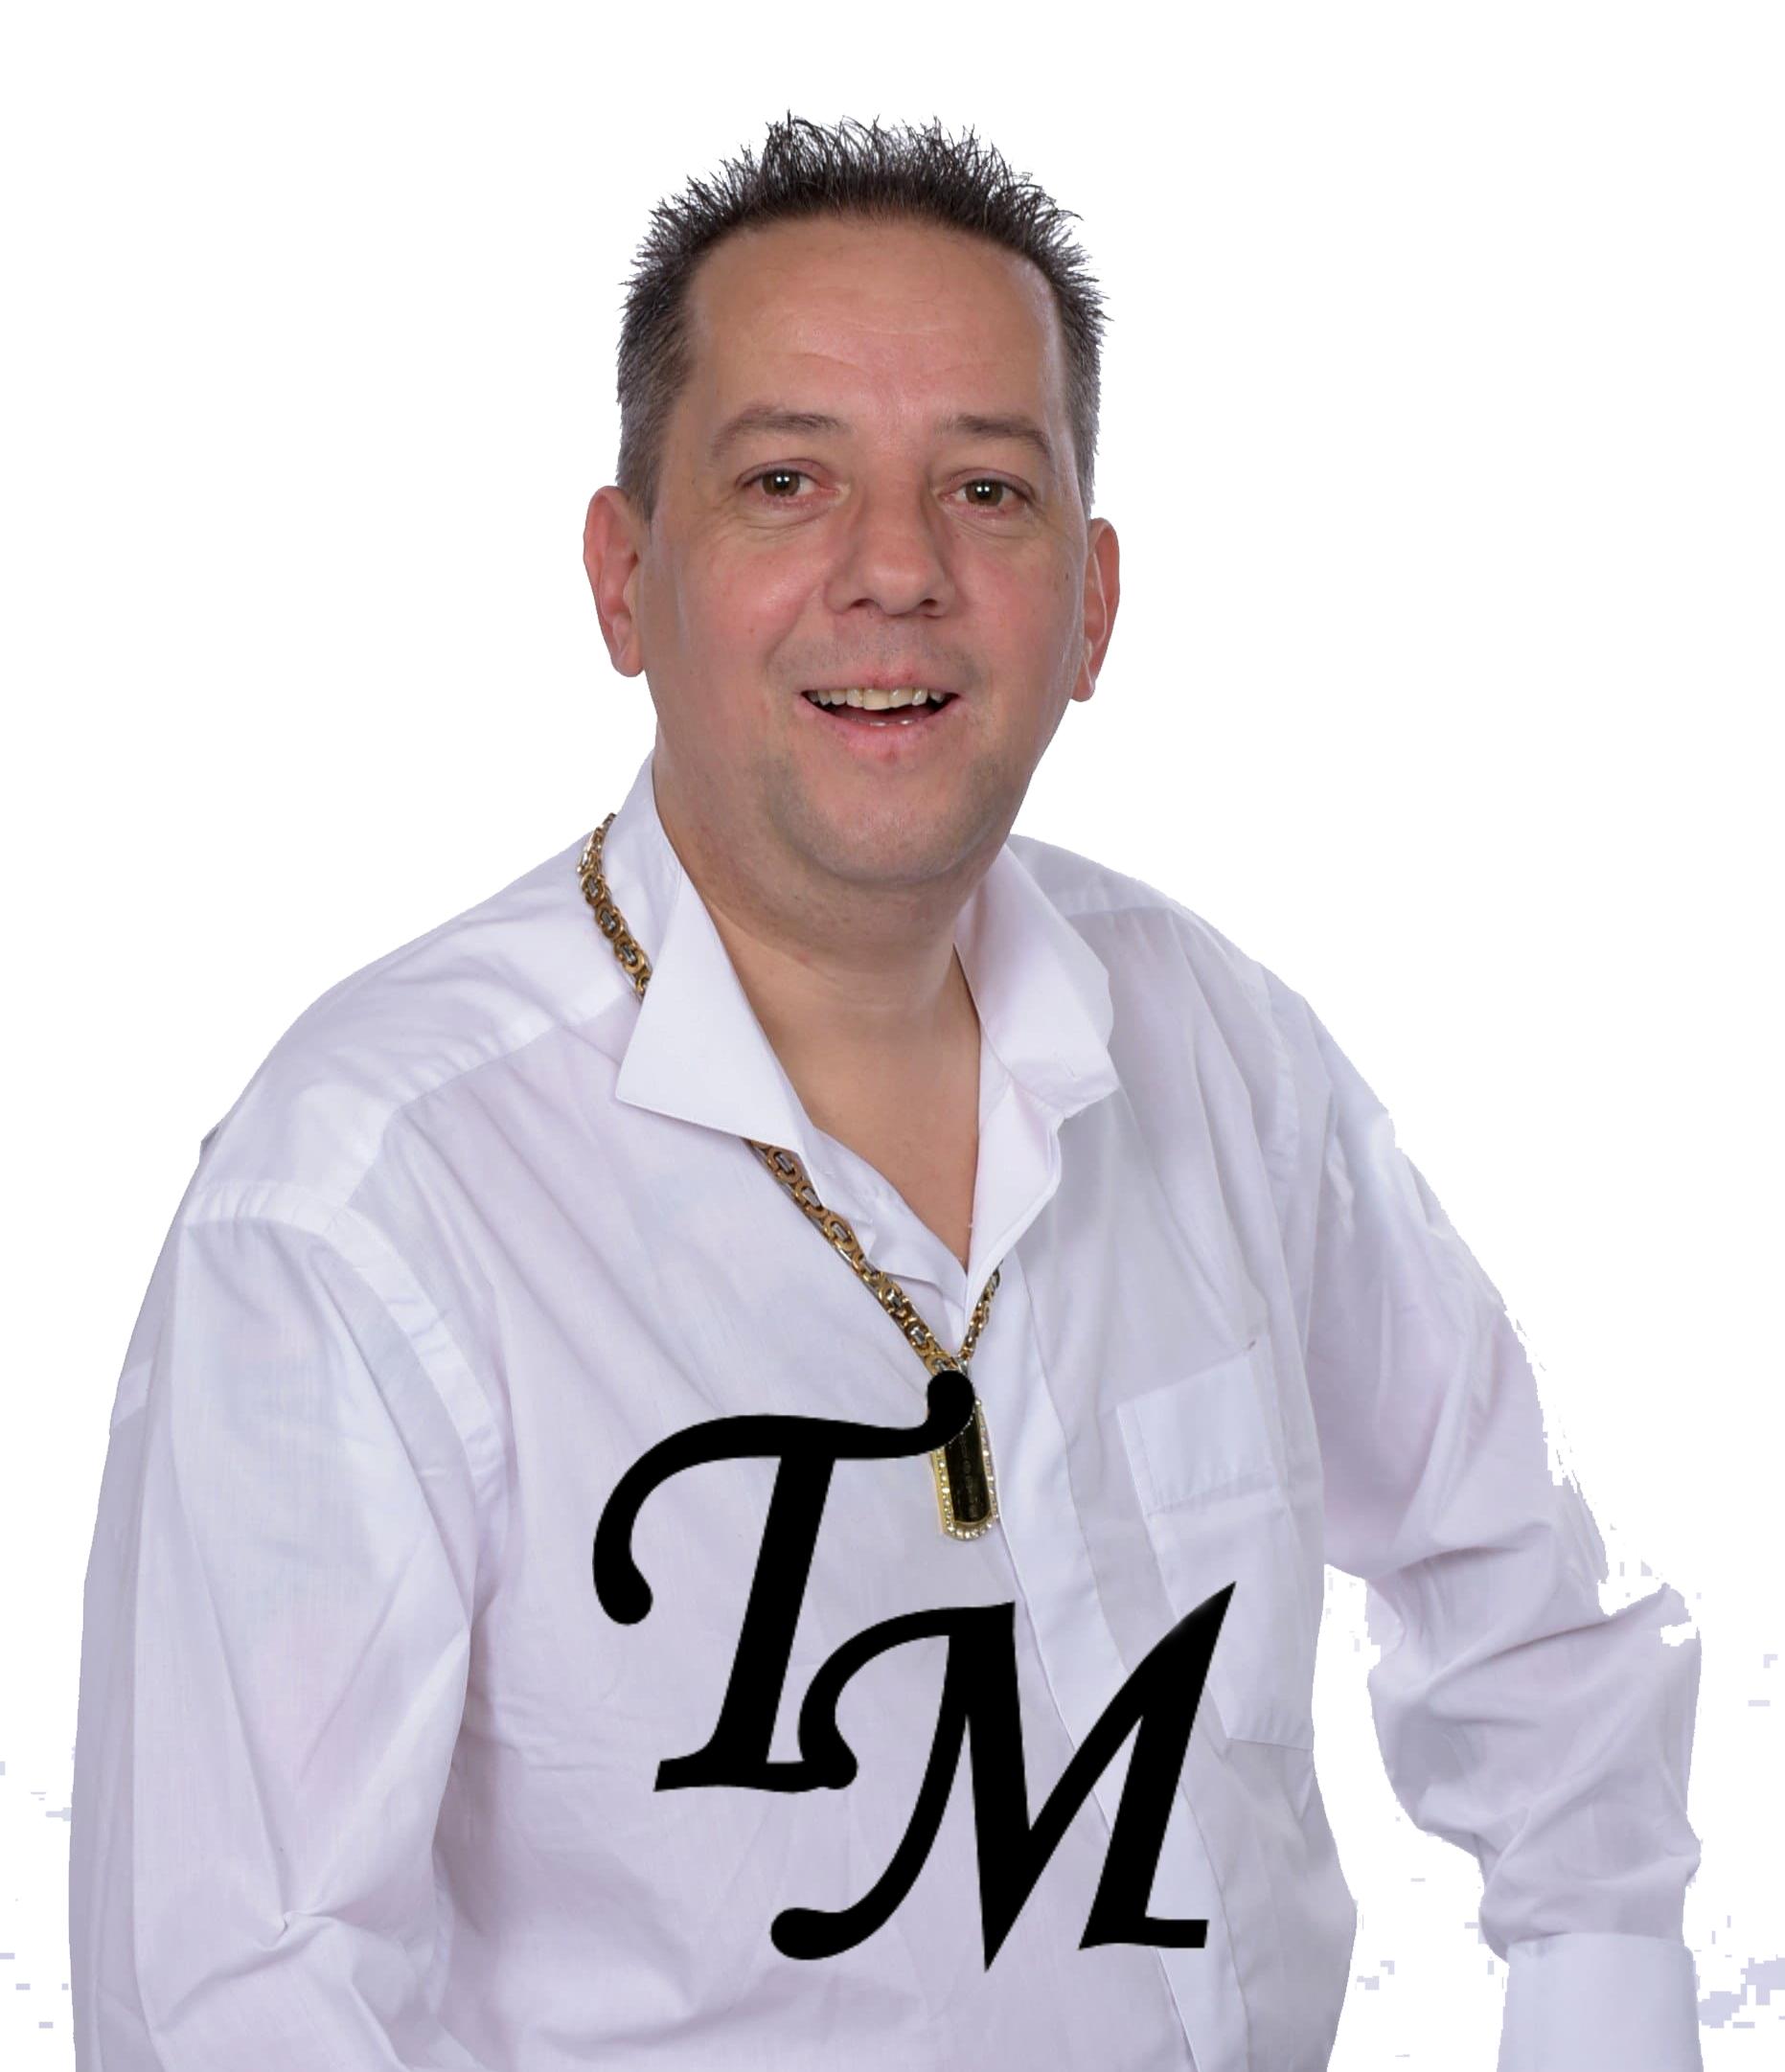 officiële website Tony Martin